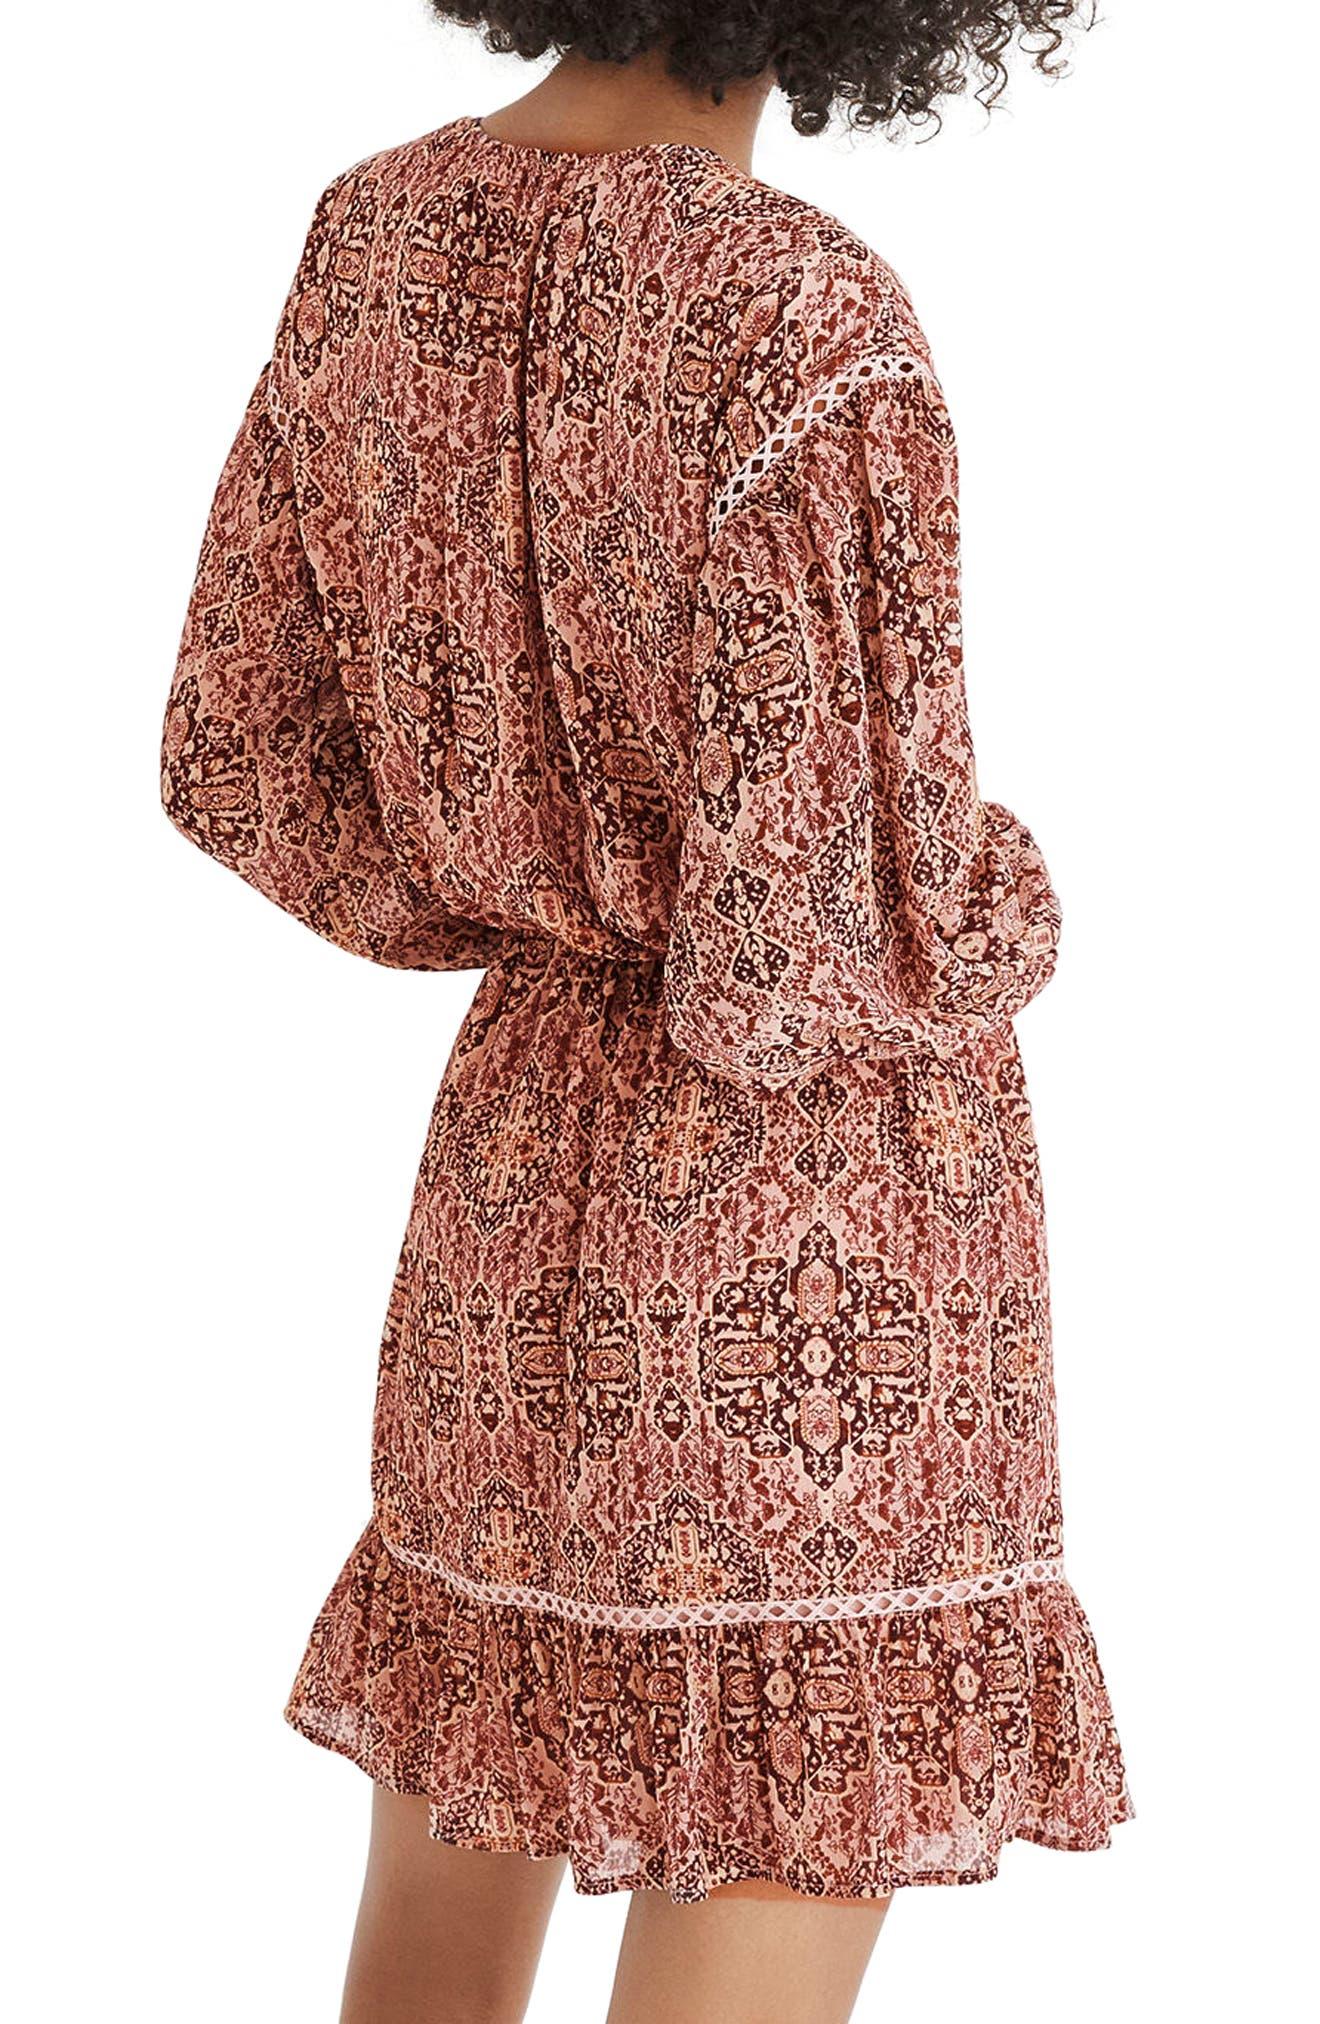 Drawstring Peasant Dress,                             Alternate thumbnail 2, color,                             Gentle Blush